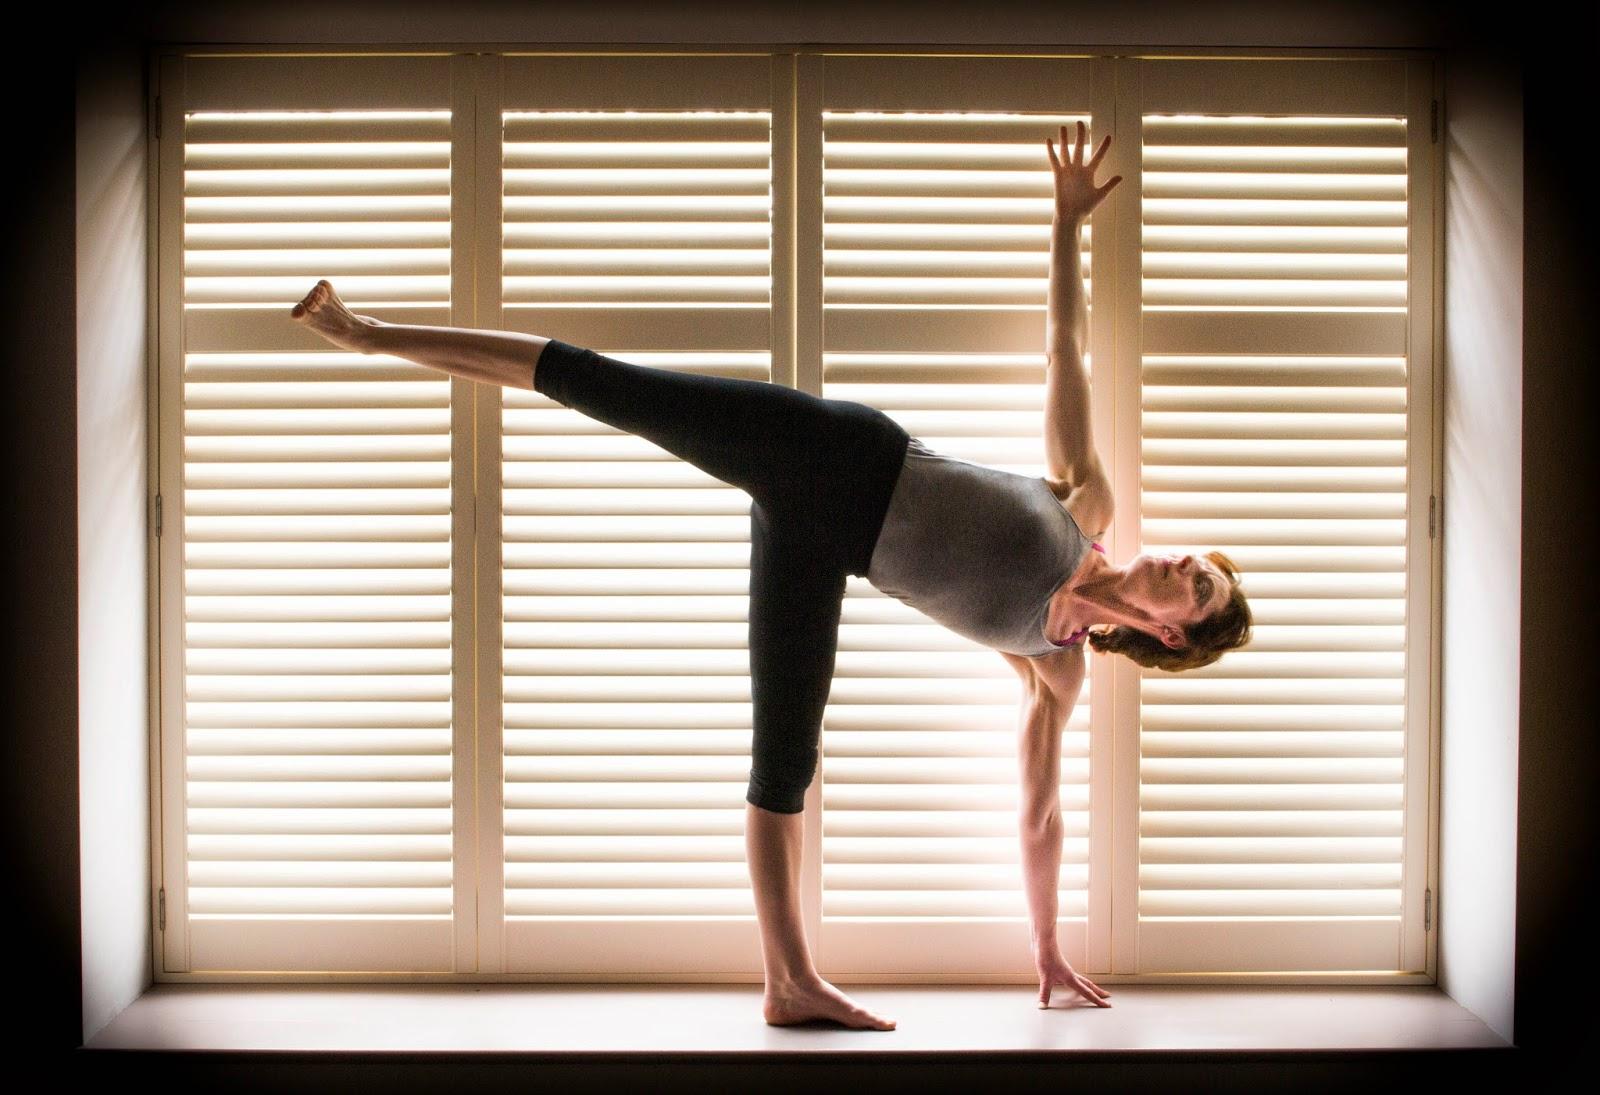 Yoga Pose, Toward Yoga, Yoga bishops Stortford, Yoga Bishop's Stortford, Yoga Herts, TowardYoga, beginner's yoga, Iyengar yoga, yoga essex